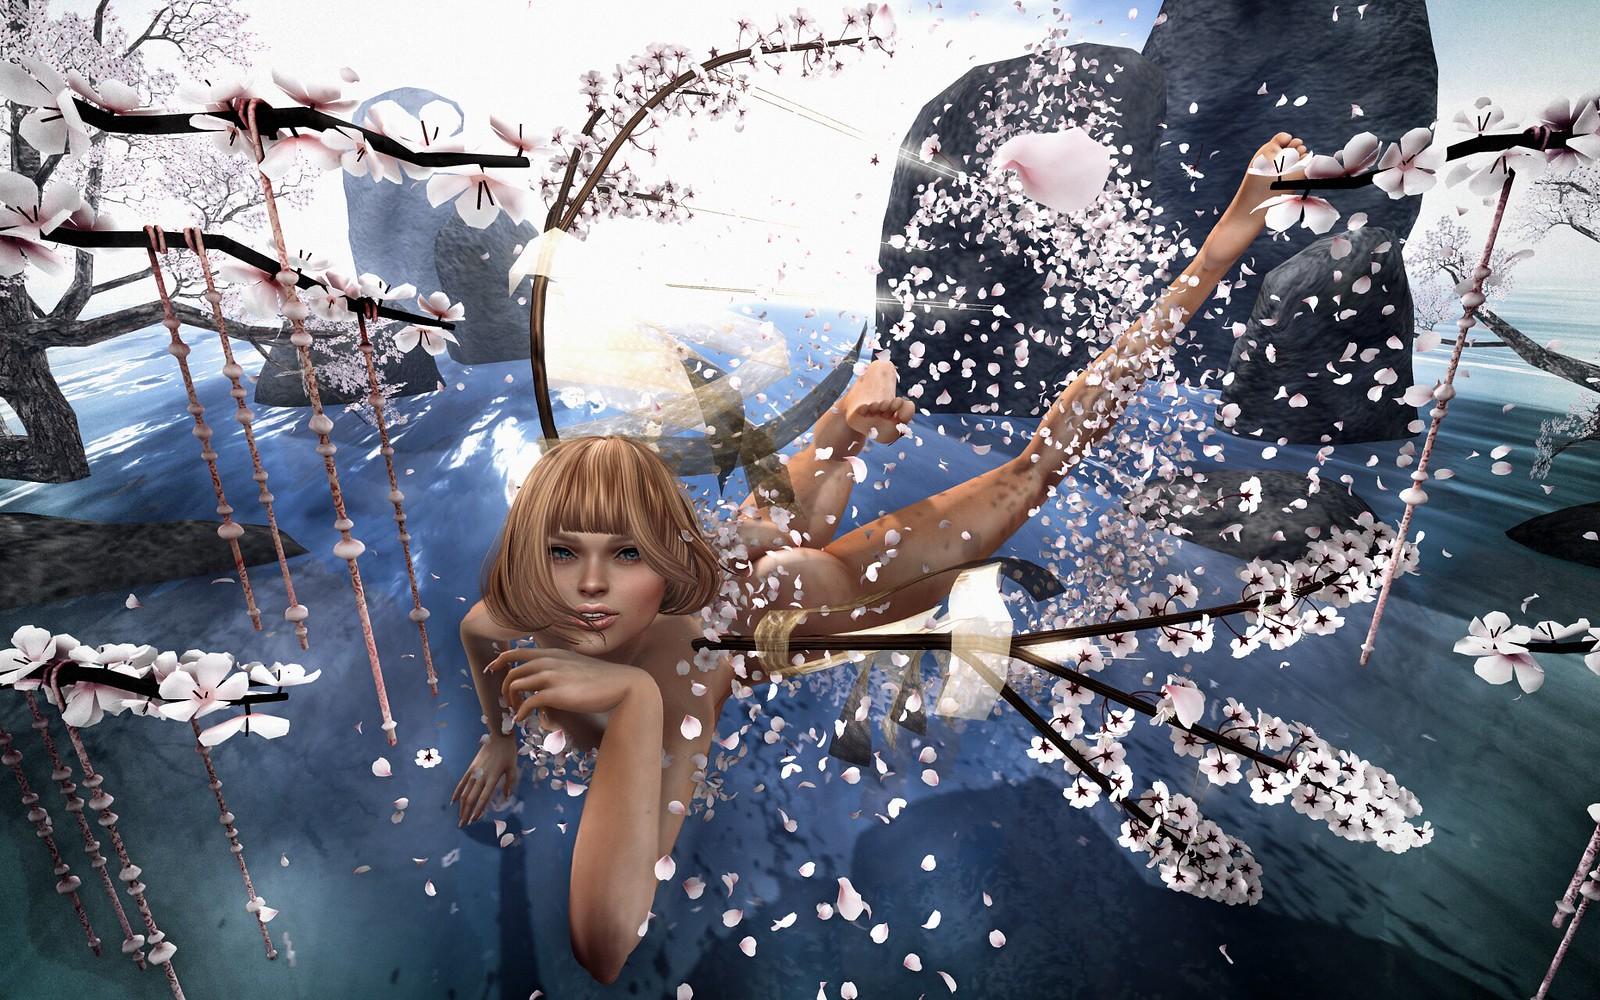 NAMINOKE/ROQUAI Sakura petals for Fantasy Faire